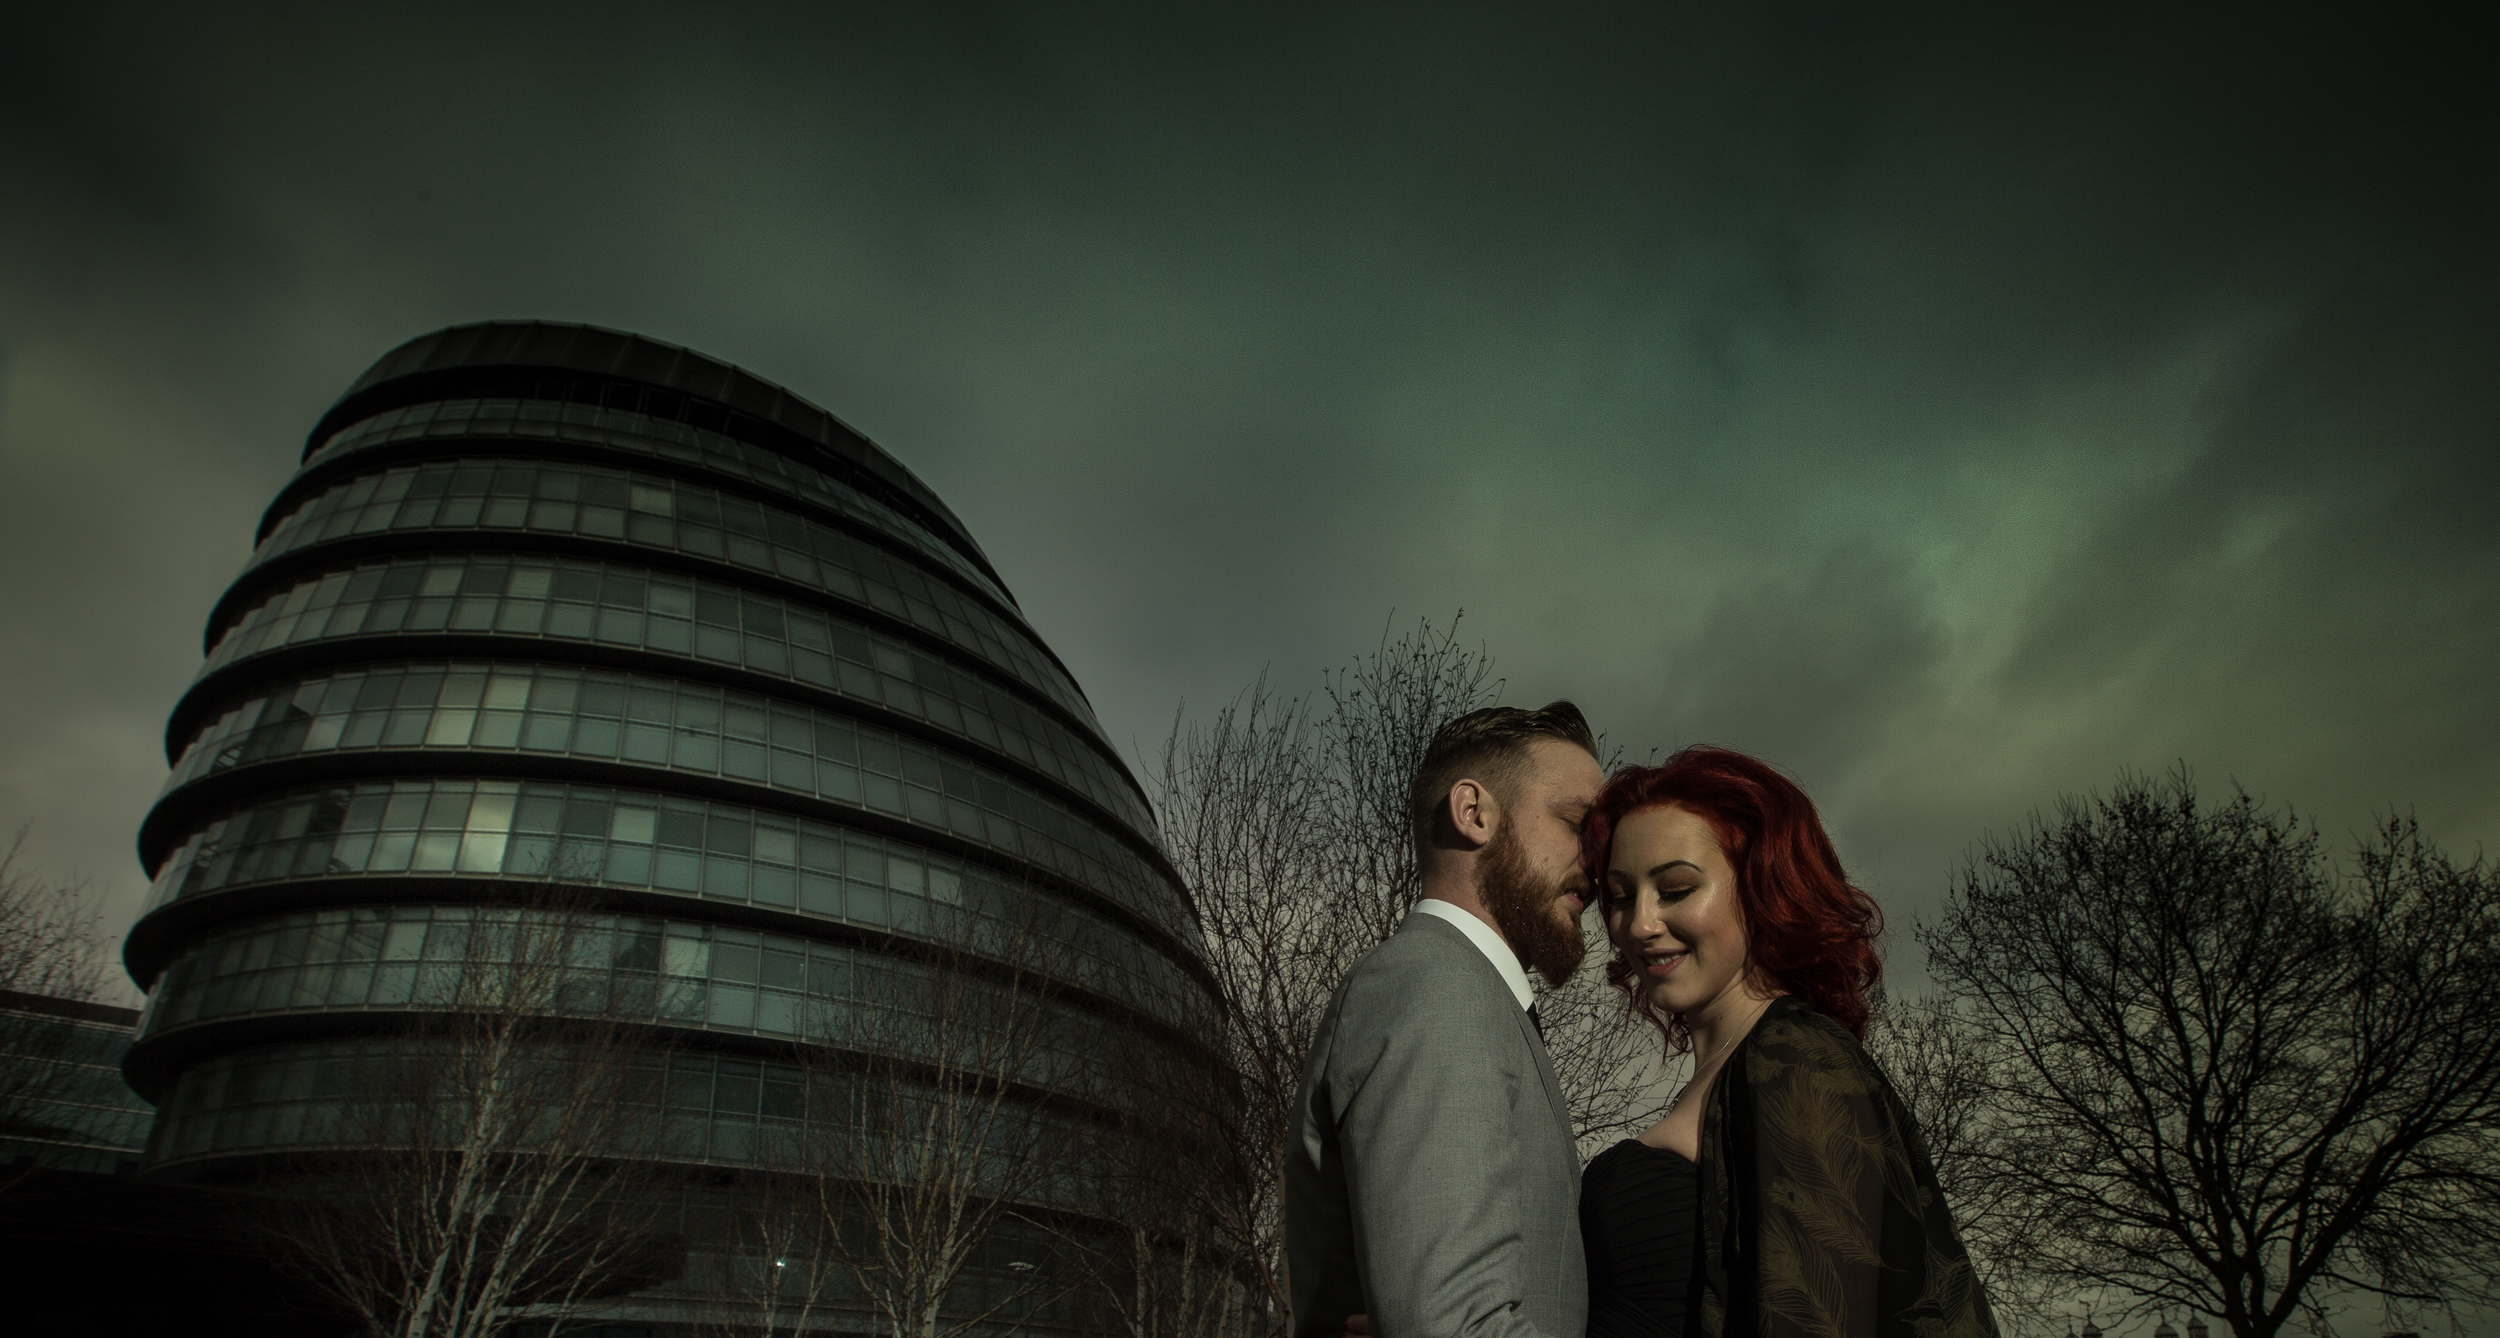 tower-bridge-engagement-london-uk-destination-wedding-photography-Adam-Rowley